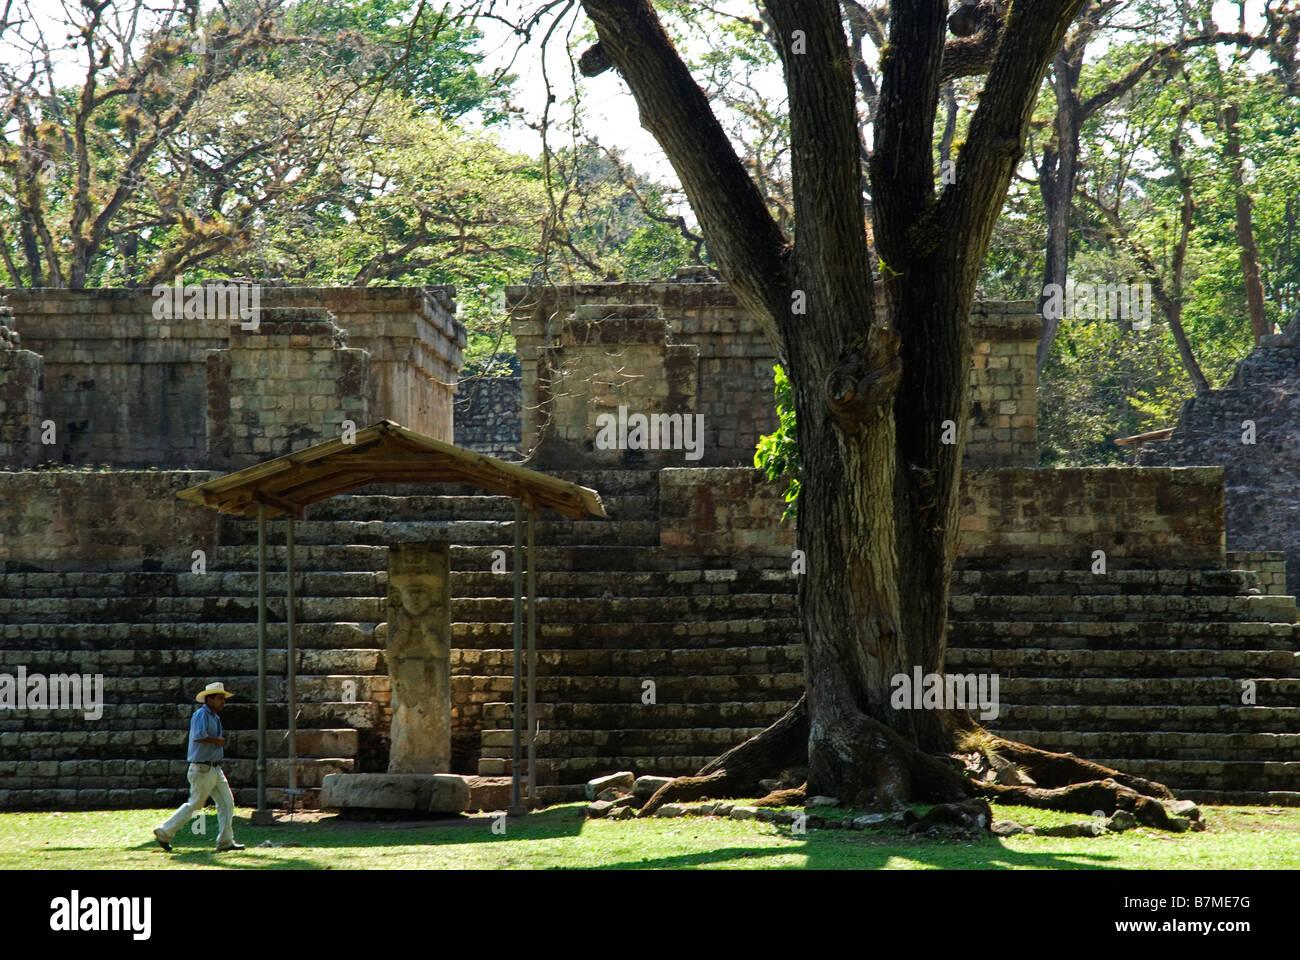 Honduras, Copan, Maya Ruins of Copan, a UNESCO World Heritage Site. - Stock Image